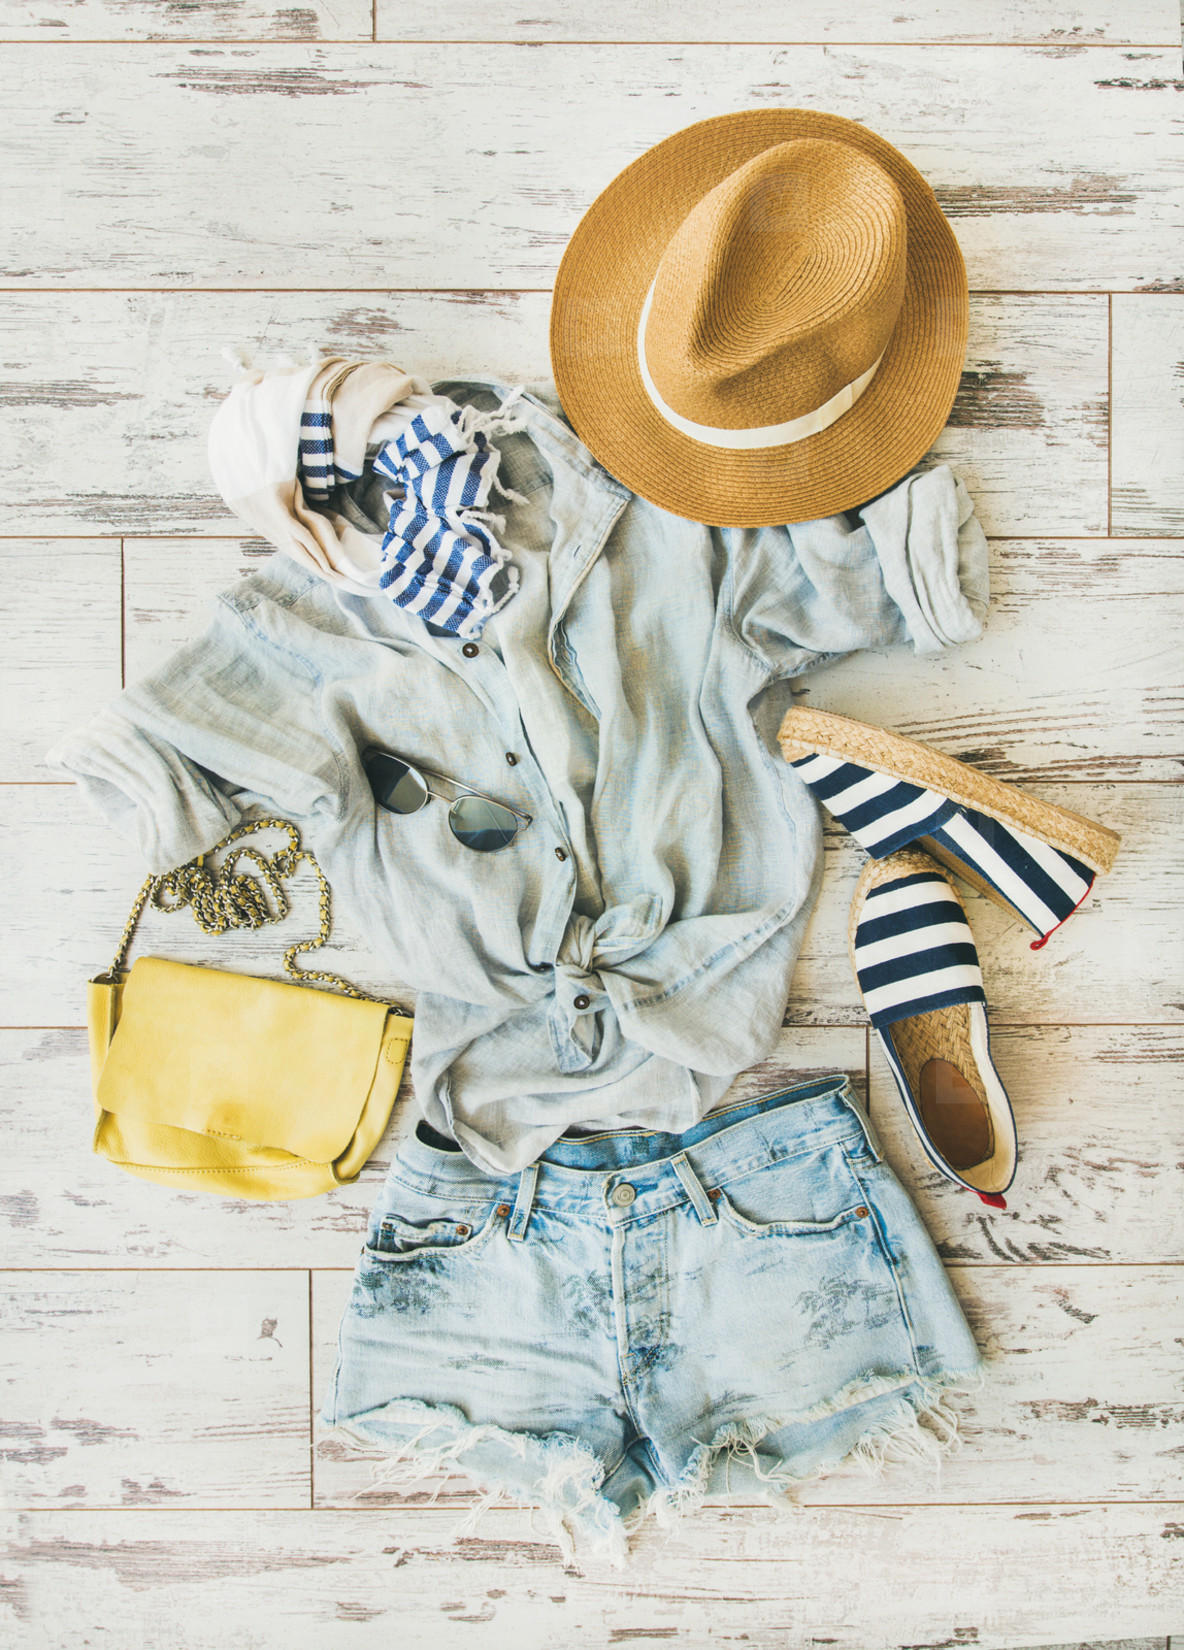 Pastel summer womens clothes  parquet background  top view